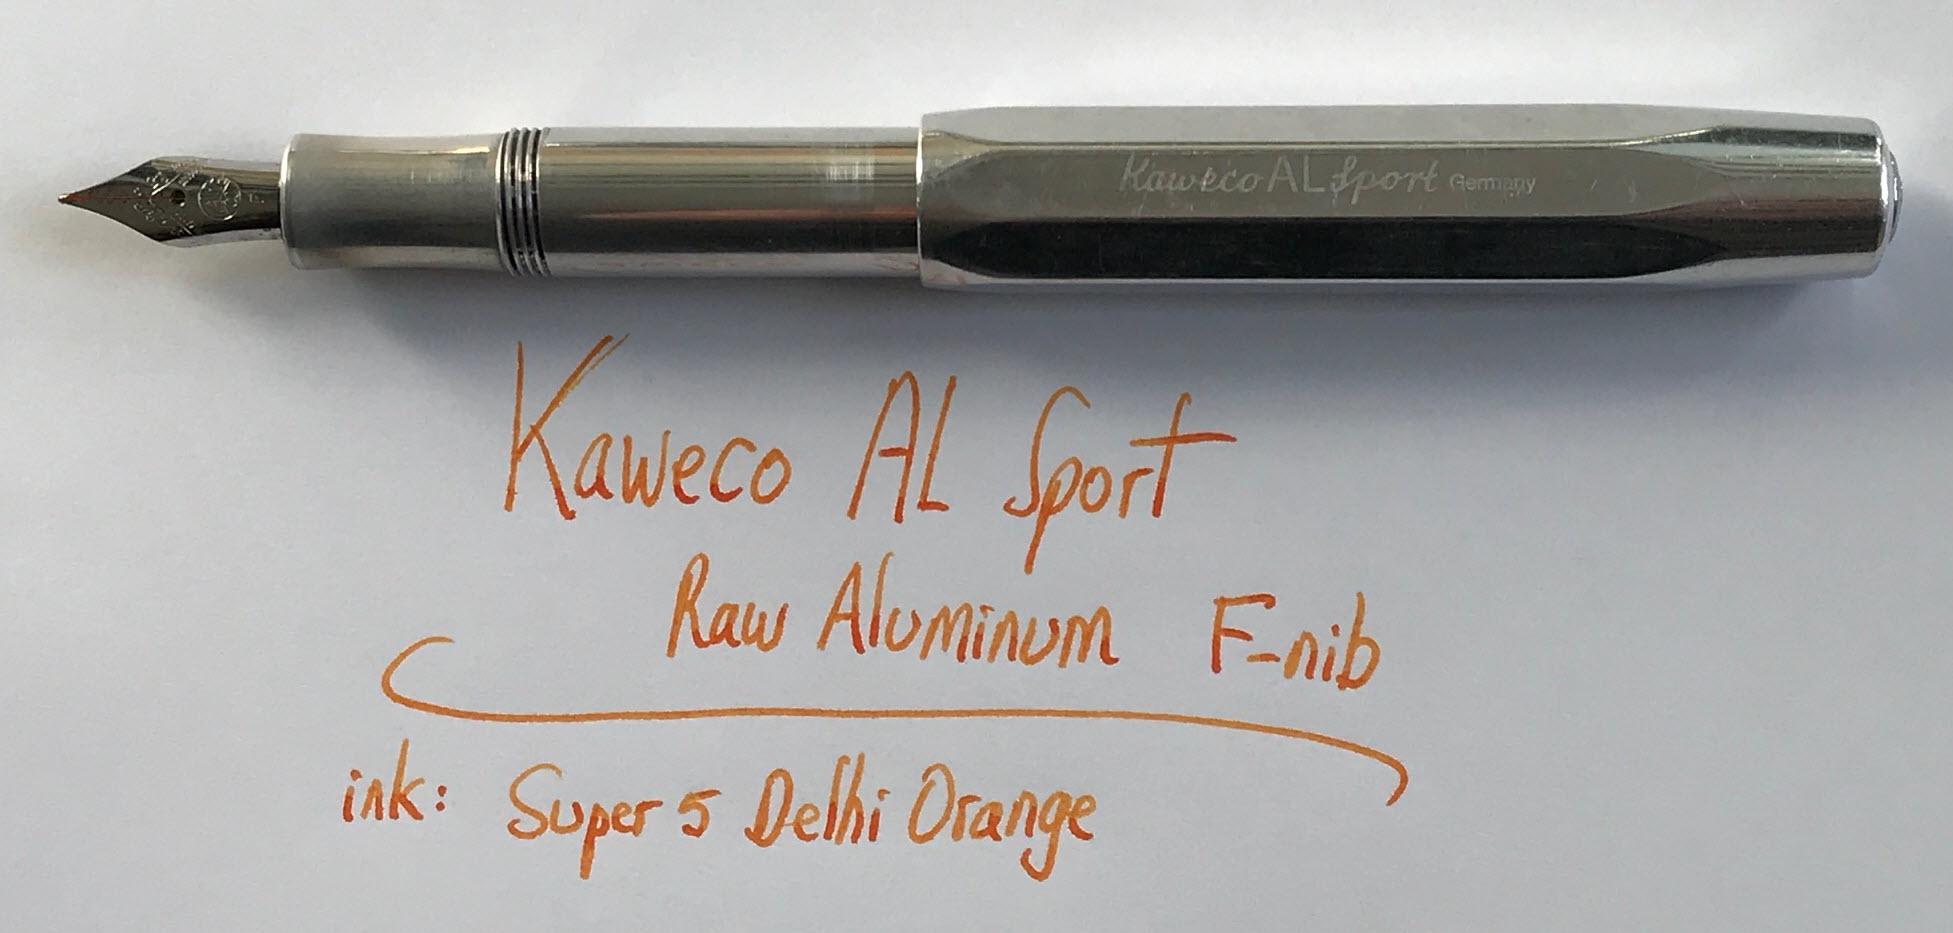 fpn_1541191620__kaweco_al_sport_-_title.